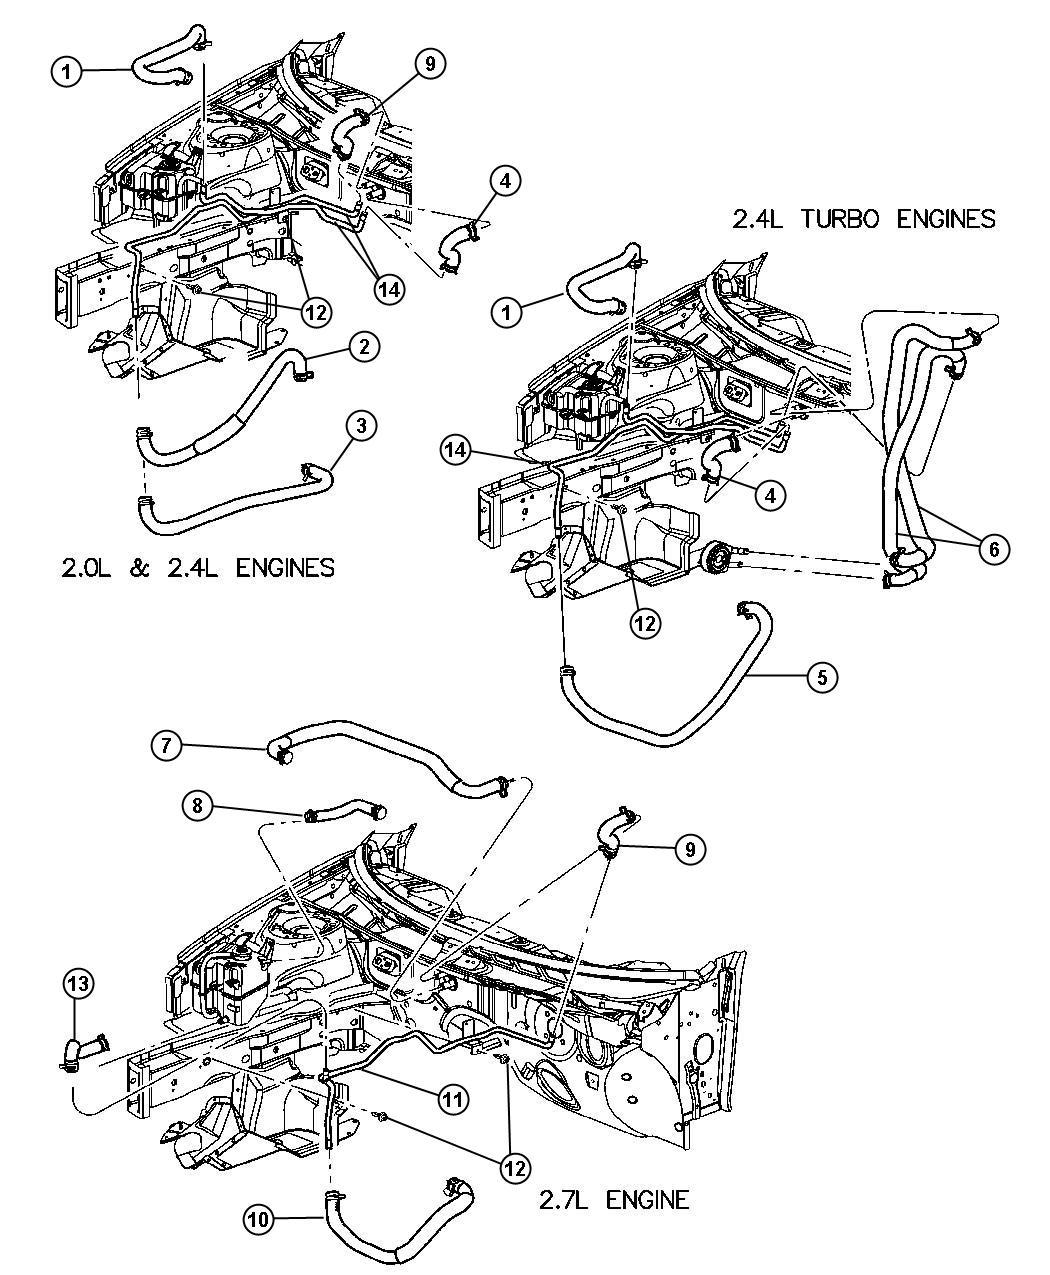 Jeep 2 7l Engine Diagram - Wiring Diagram Directory  L Engine Diagram on